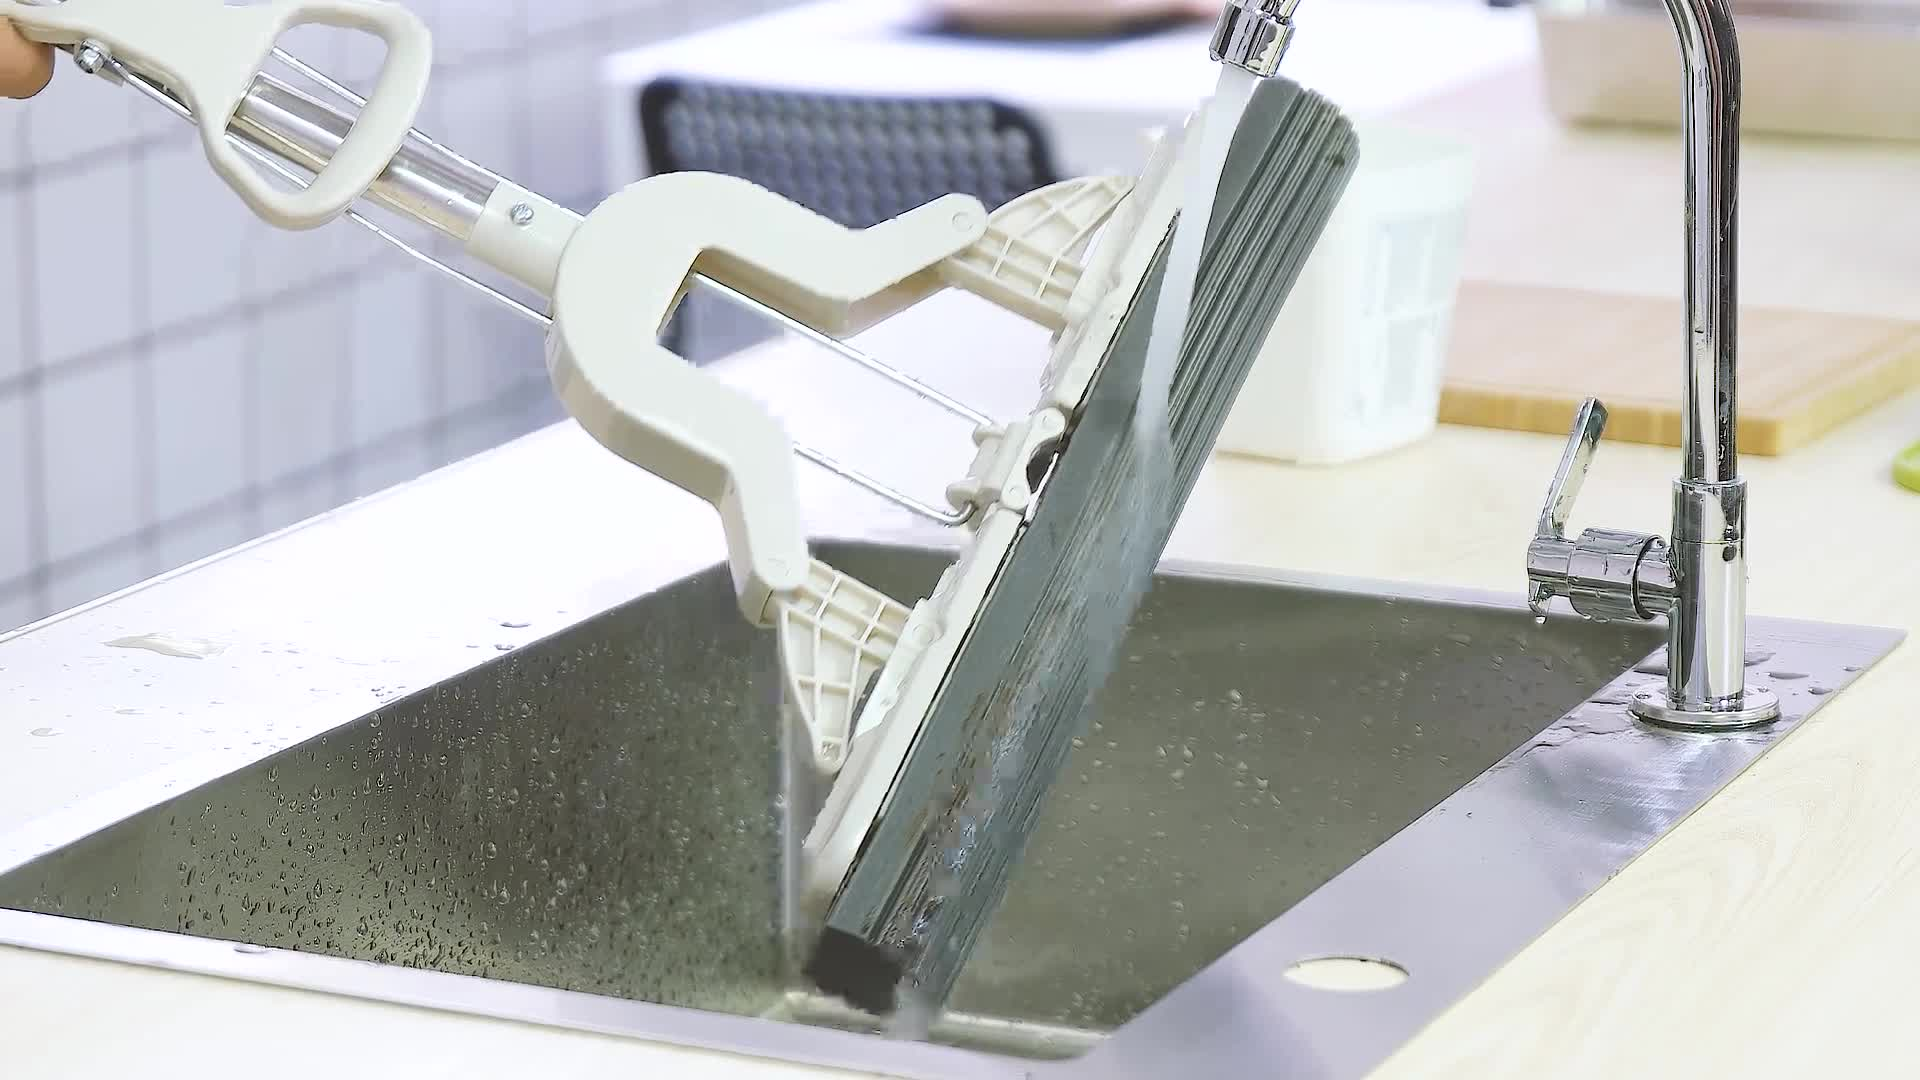 Haushalt Dauerhaft Folding Typ PVA Mopp Schwamm Mopp mit teleskop edelstahl pol